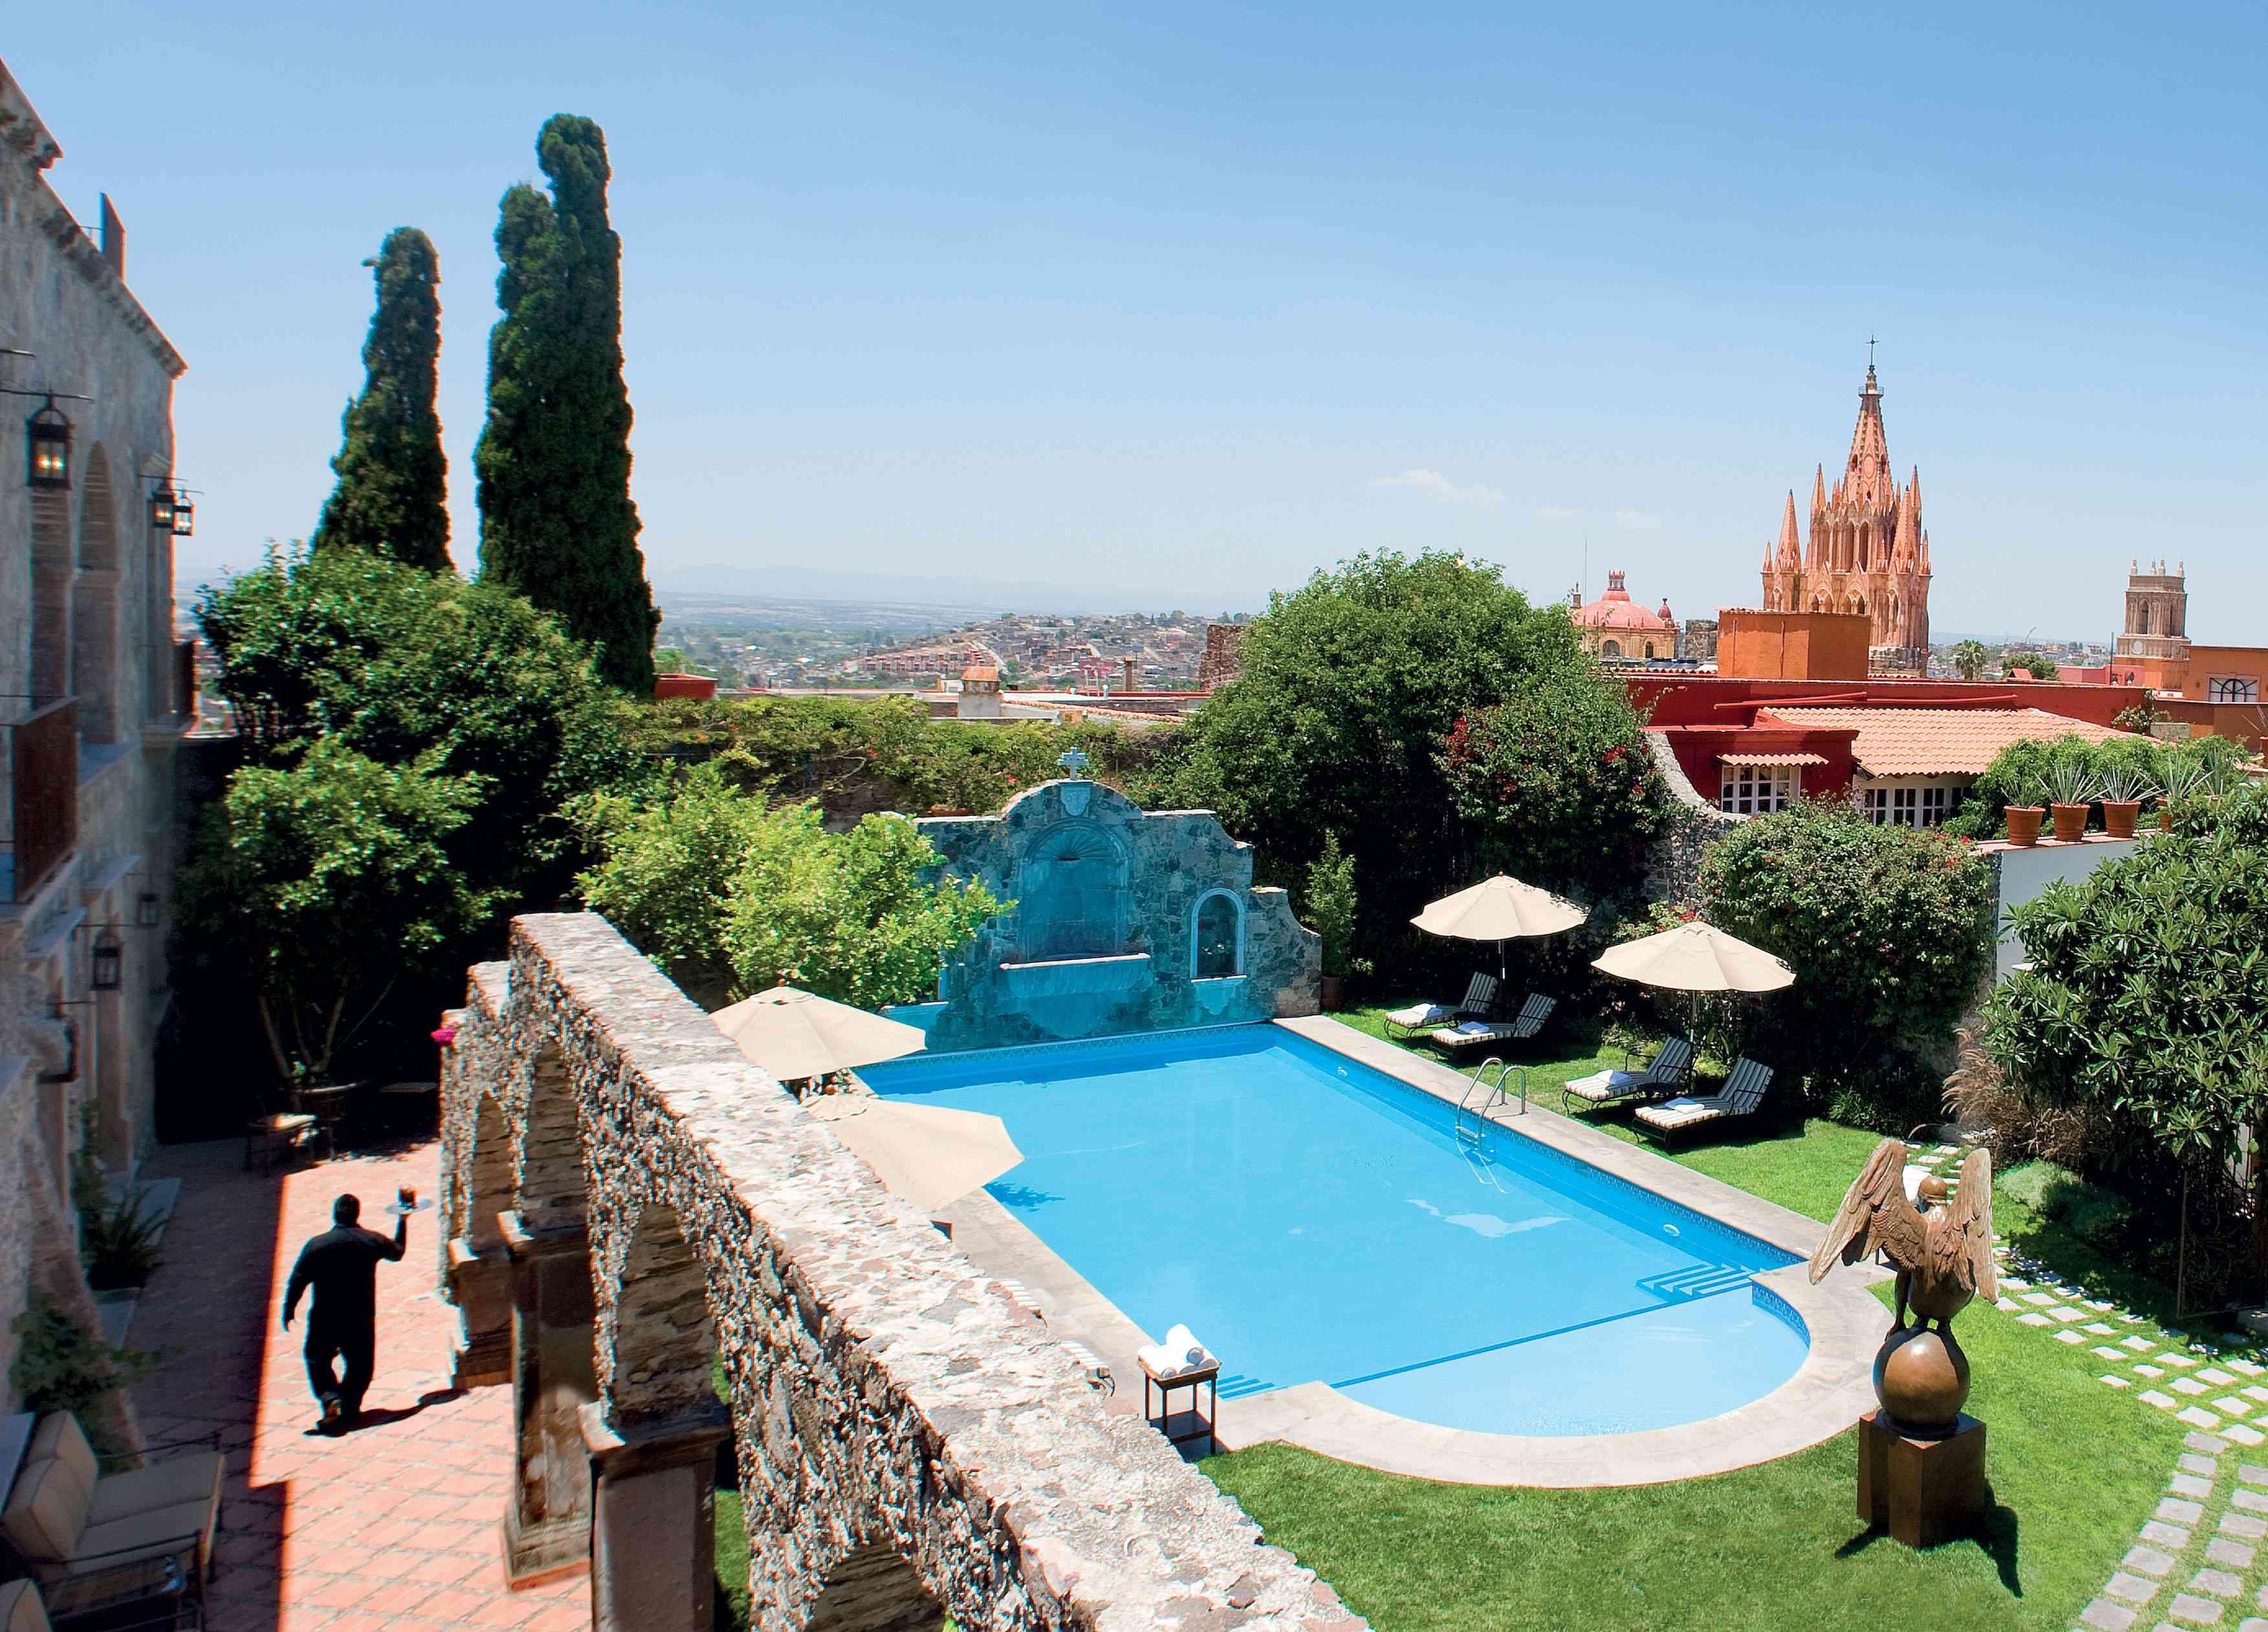 A view of the pool at Belmond Casa de Sierra Nevada.